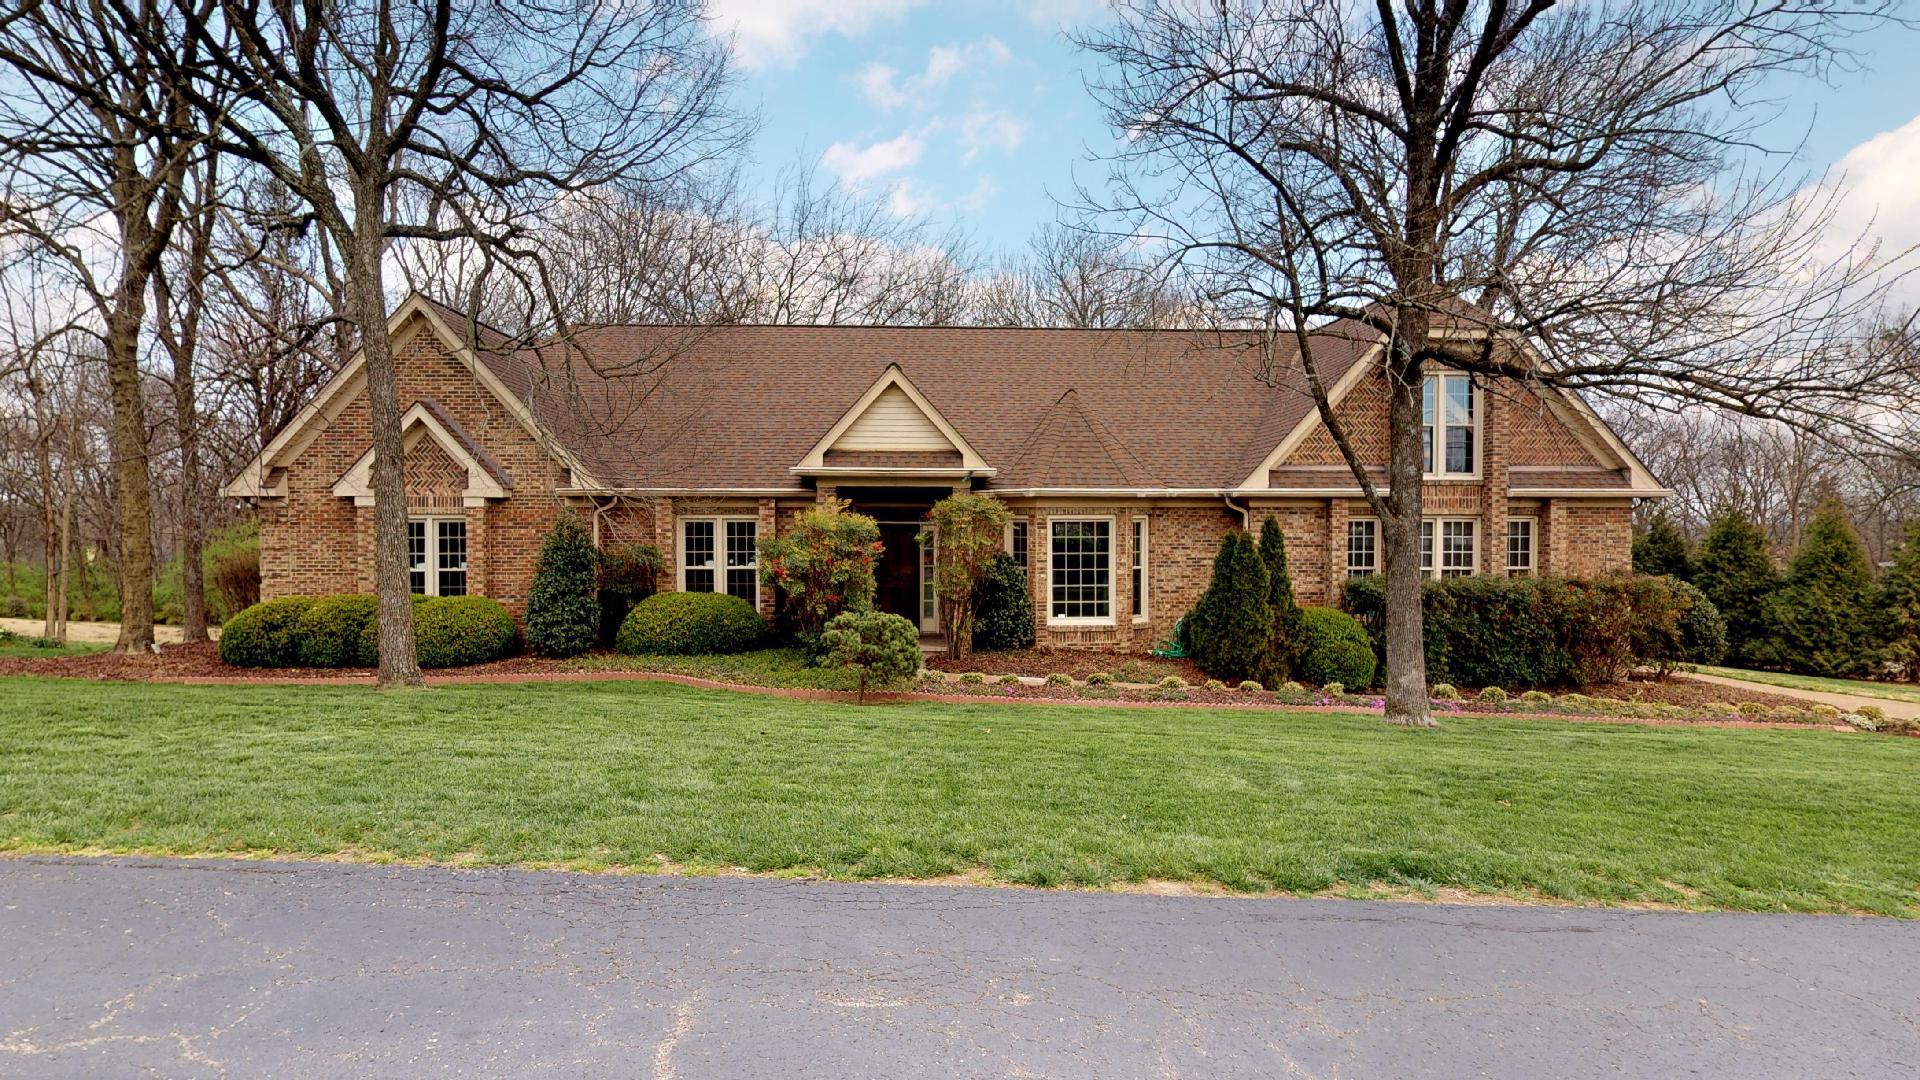 758 Peach Orchard Dr. , Nashville, TN 37204 - Nashville, TN real estate listing